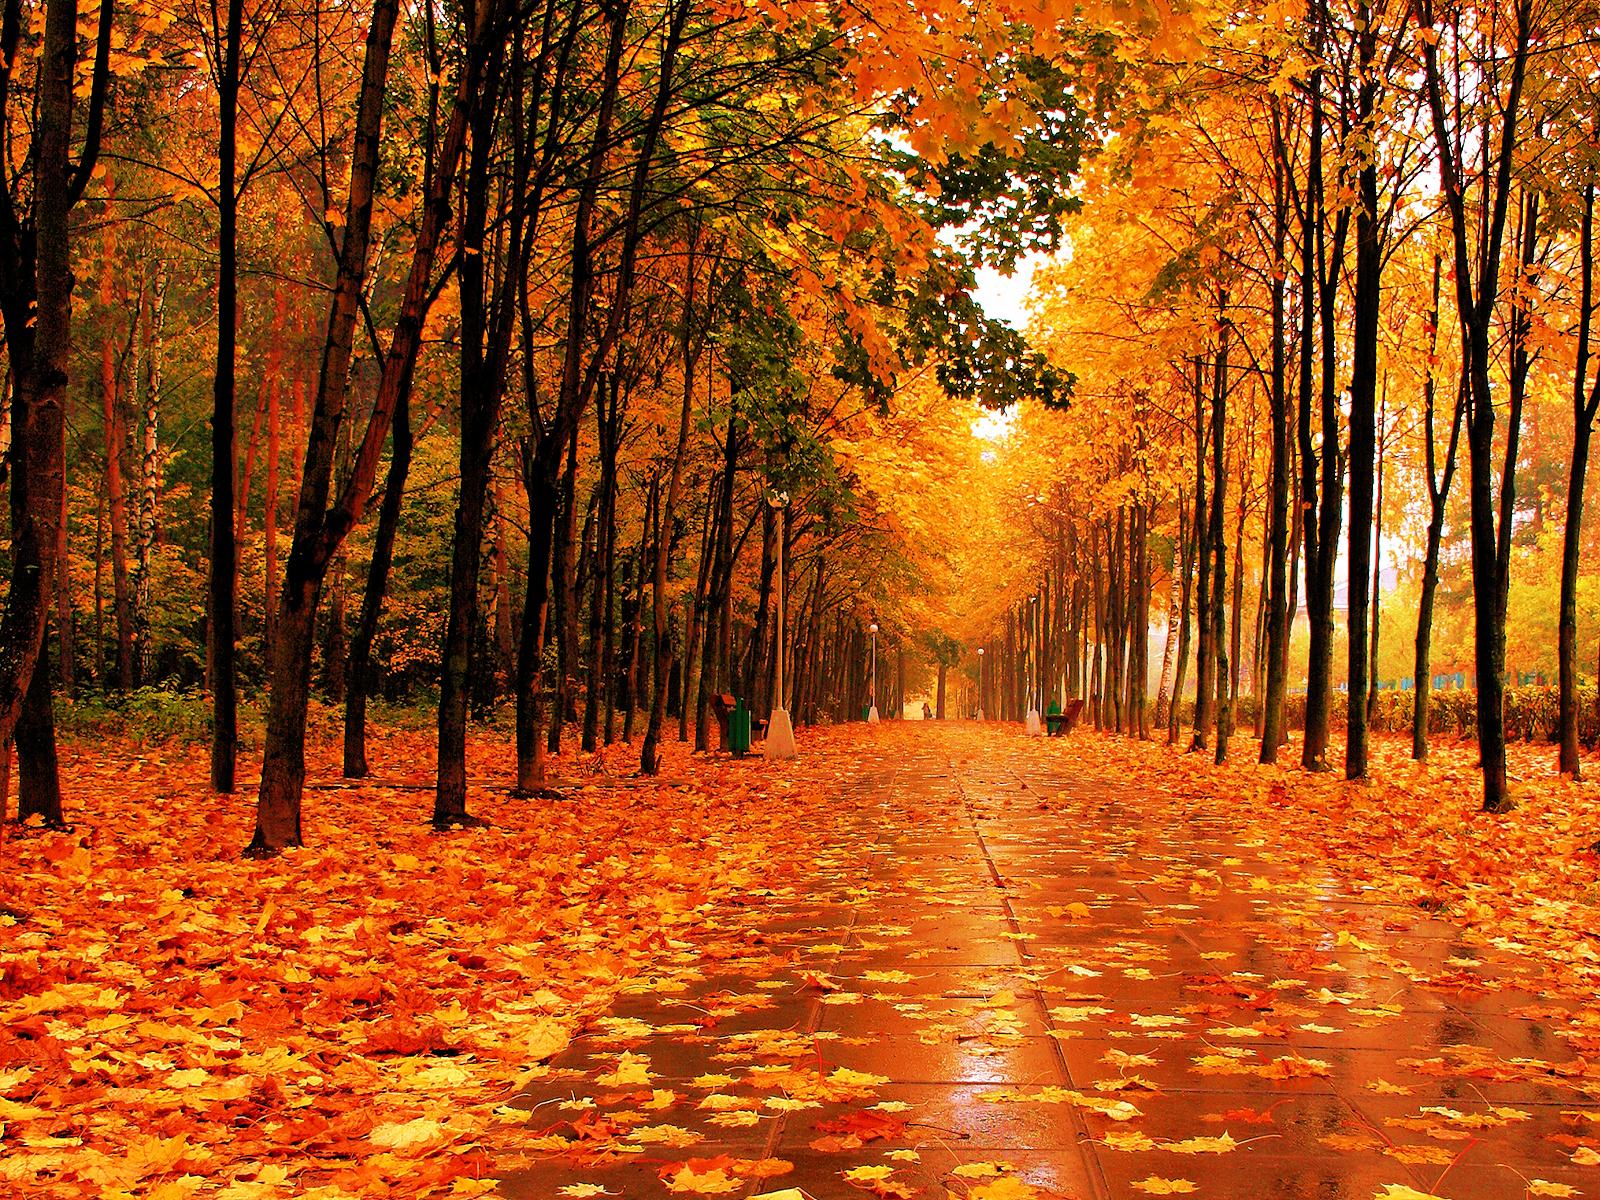 http://2.bp.blogspot.com/-V2Ei9uV3FEY/Tpr0WpLnseI/AAAAAAAAAfA/YbH76zDWD3U/s1600/park-walk-fall-wll-inkbluesky.png